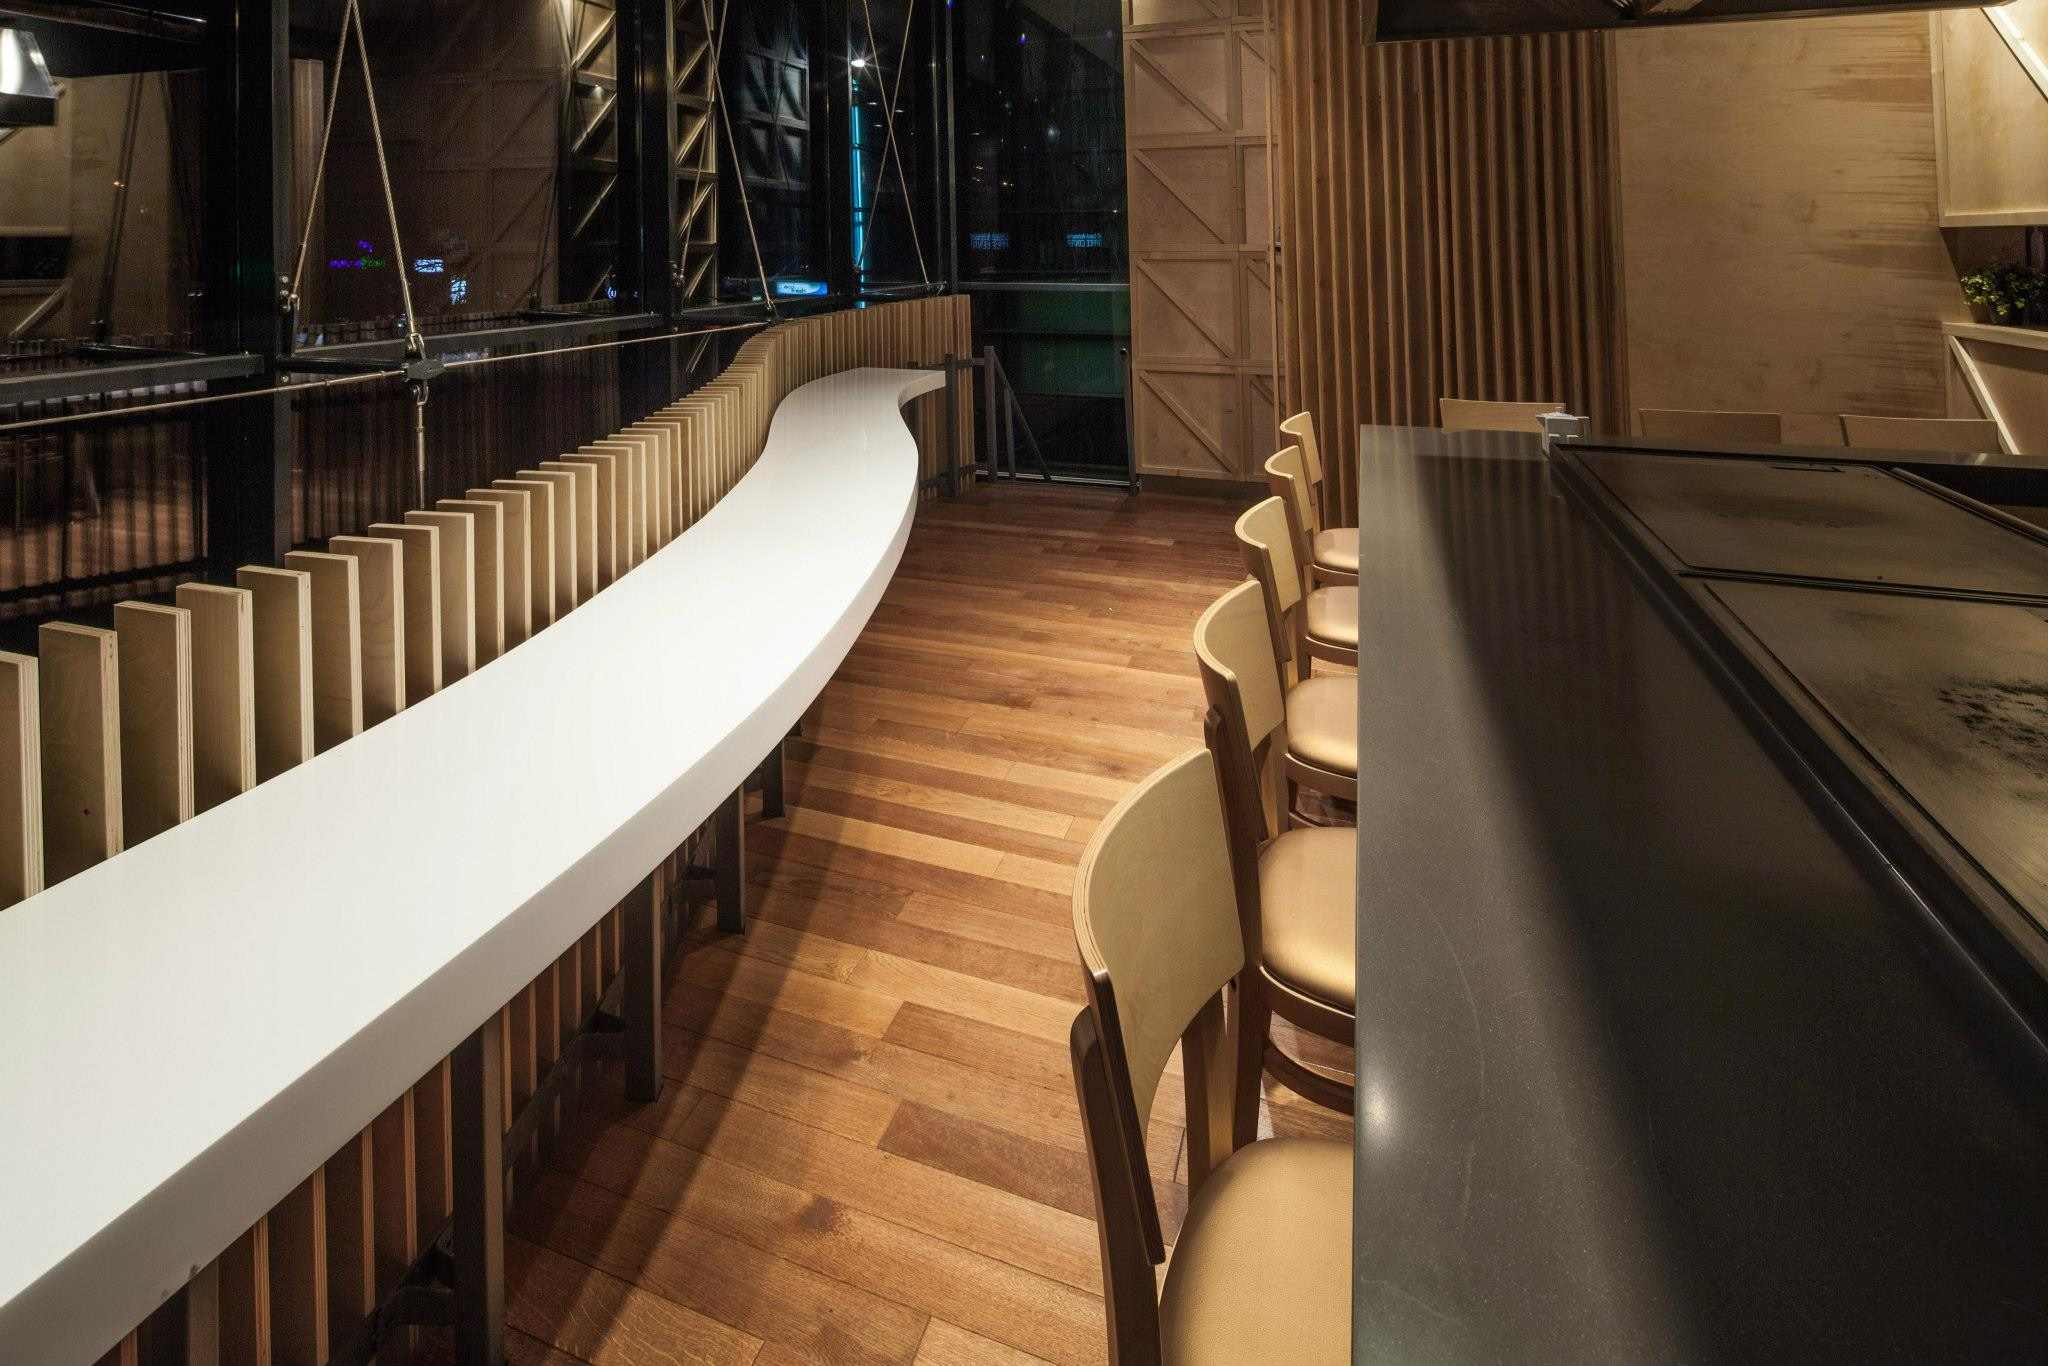 YOSHI-Sushi-Teppanyaki-Trivenus-Ama-Design-20